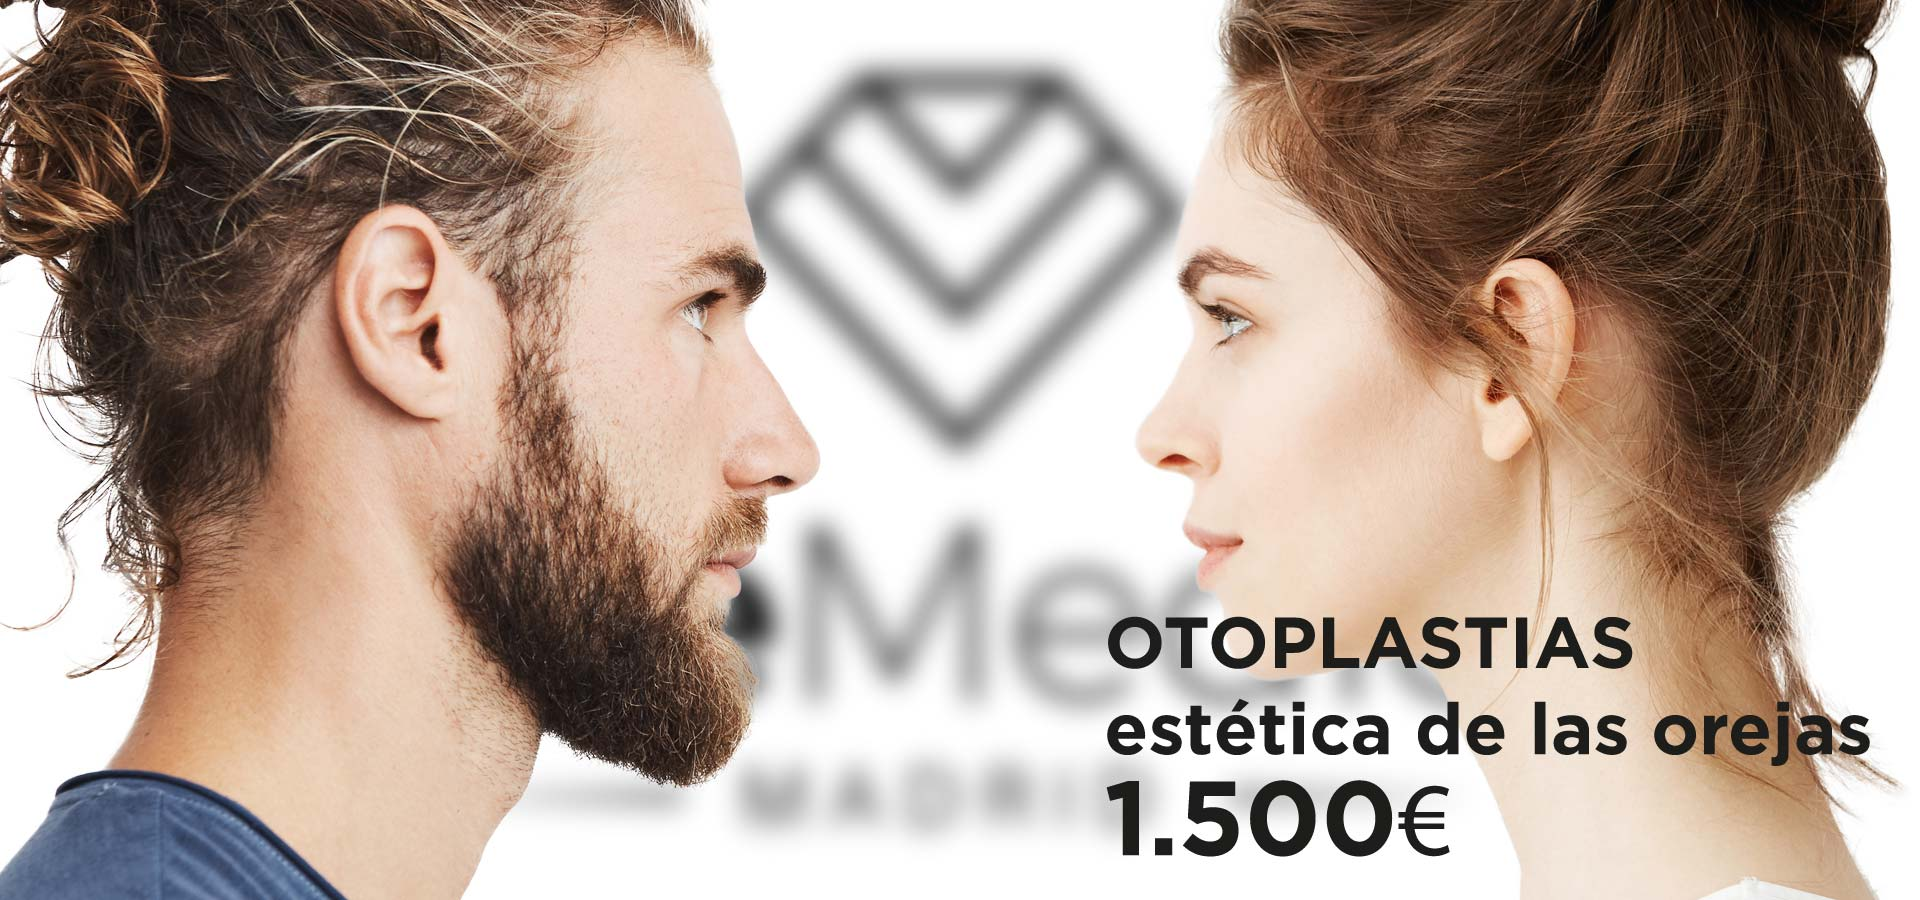 Ofertas cirugía estética Otoplastia